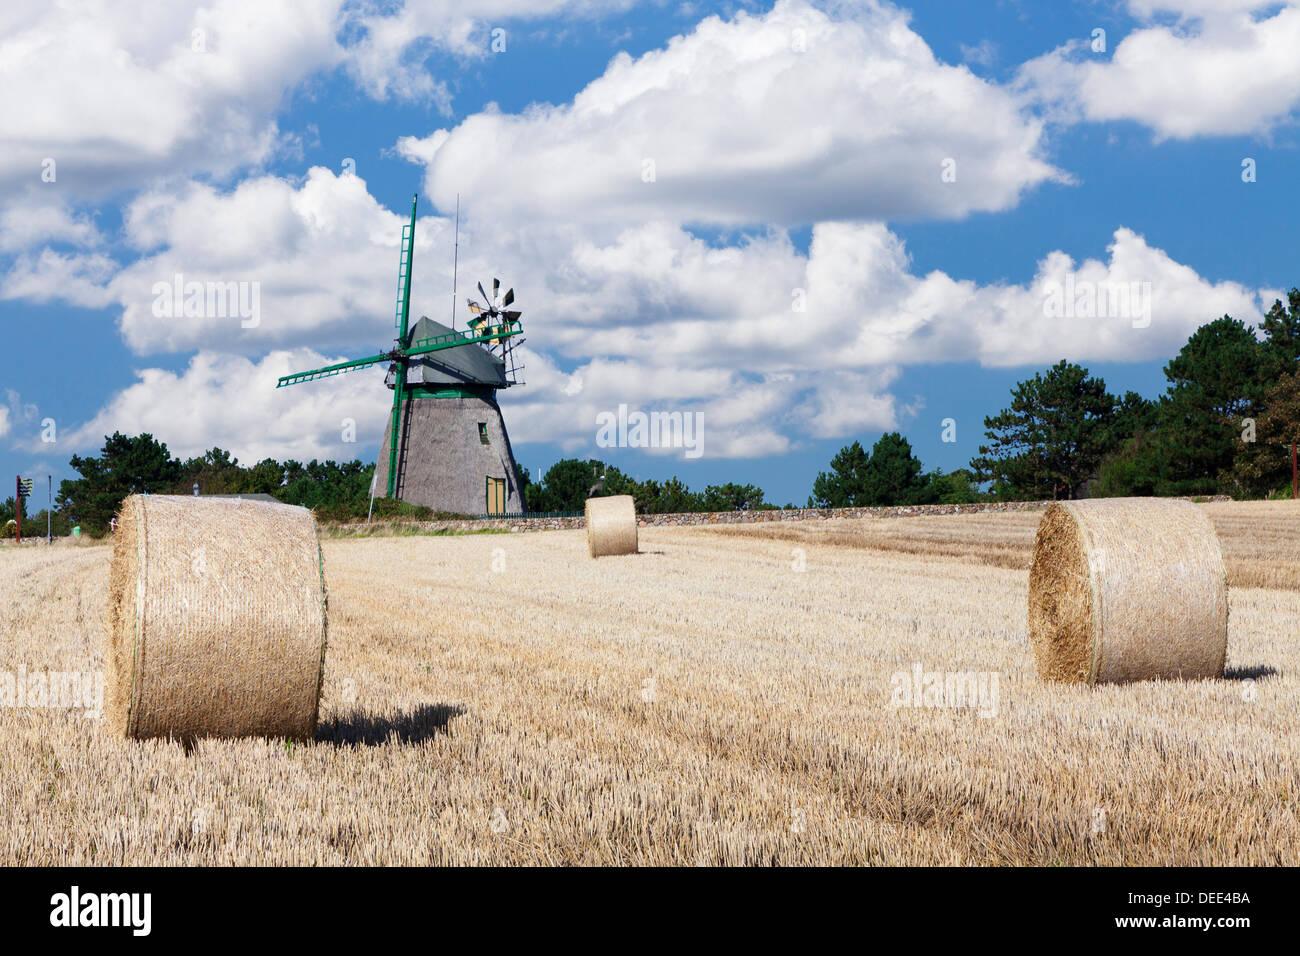 Old Dutch windmill, Nebel, Amrum, North Frisian Islands, Schleswig Holstein, Germany, Europe - Stock Image